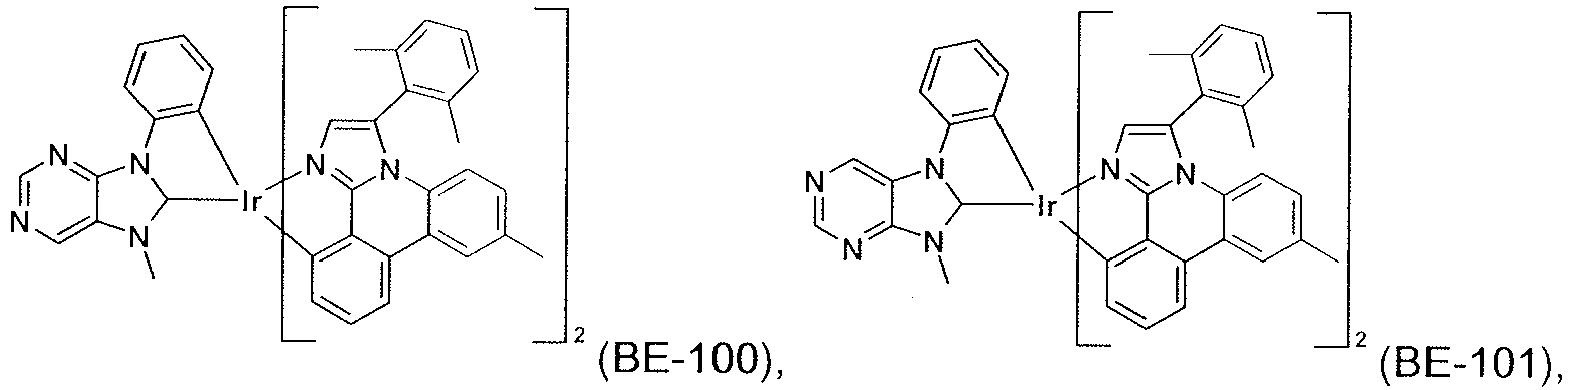 Figure imgb0638